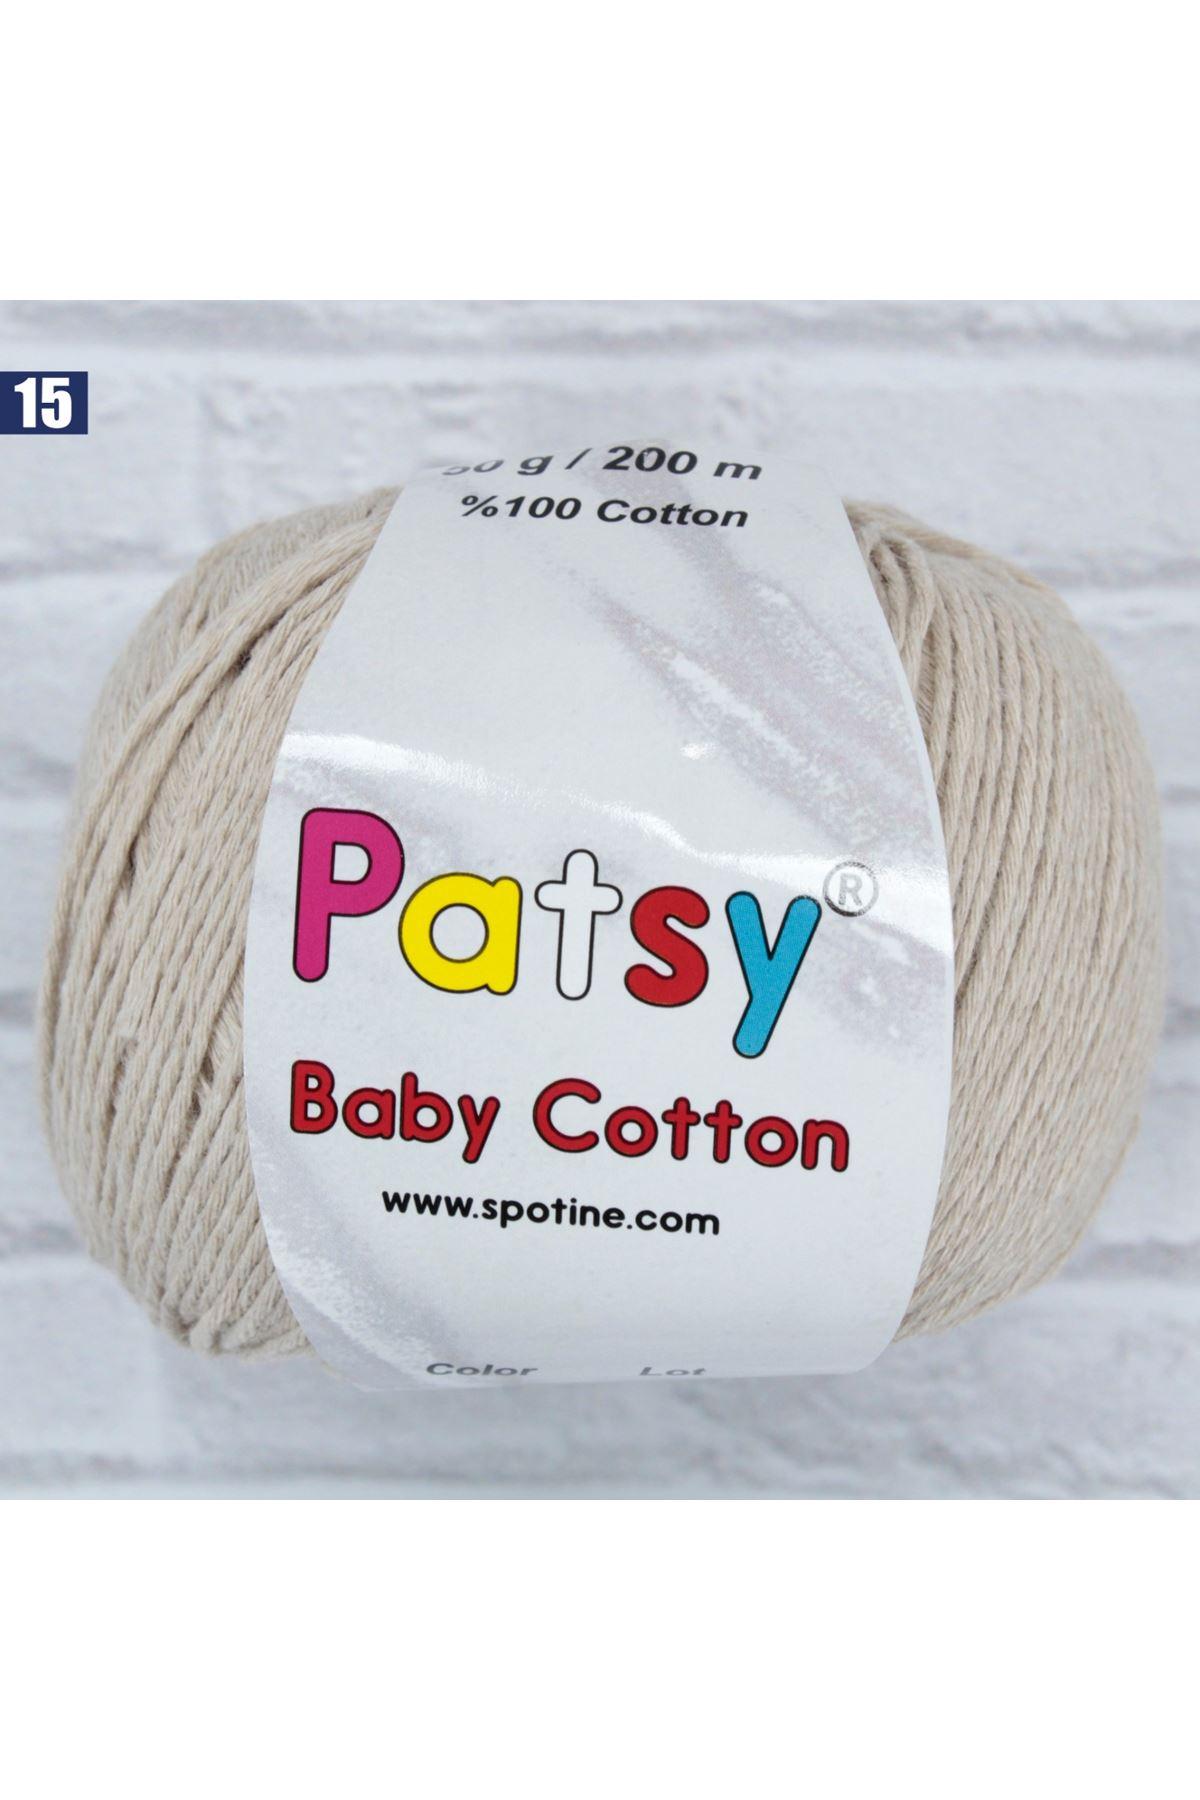 Patsy Baby Cotton 15